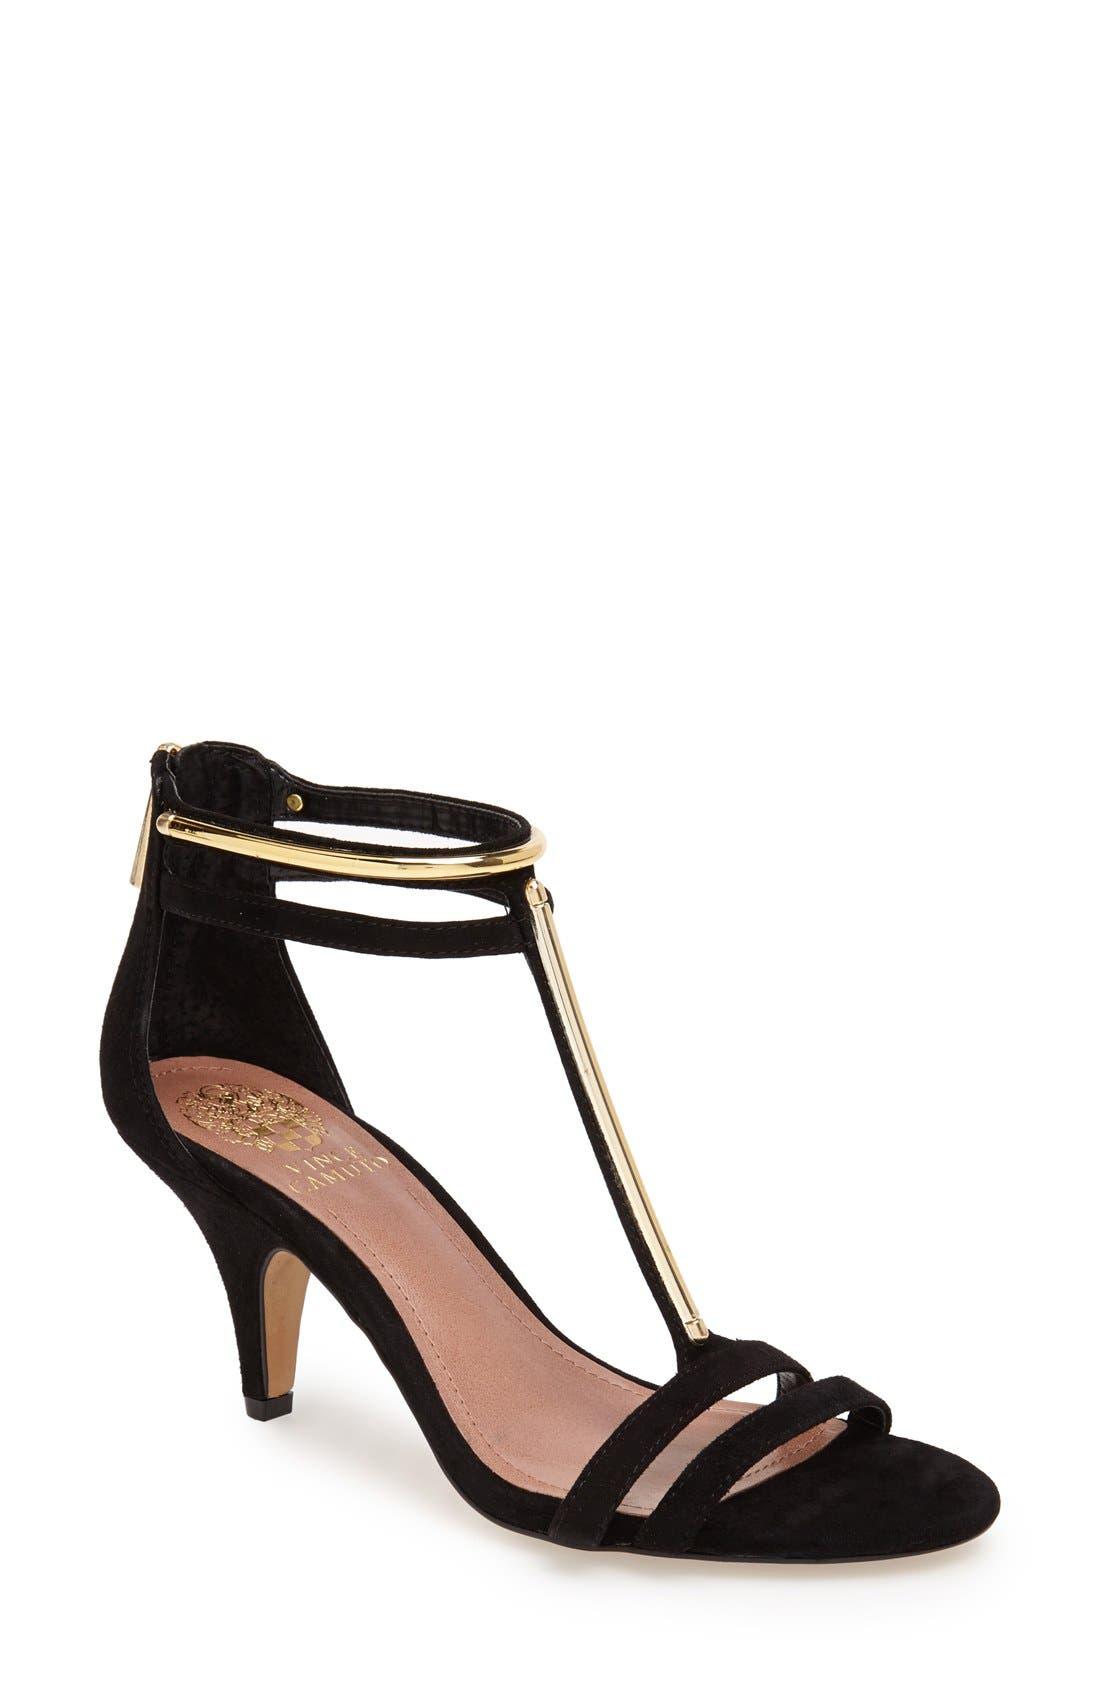 Main Image - Vince Camuto 'Mitzy' Suede T-Strap Sandal (Women)